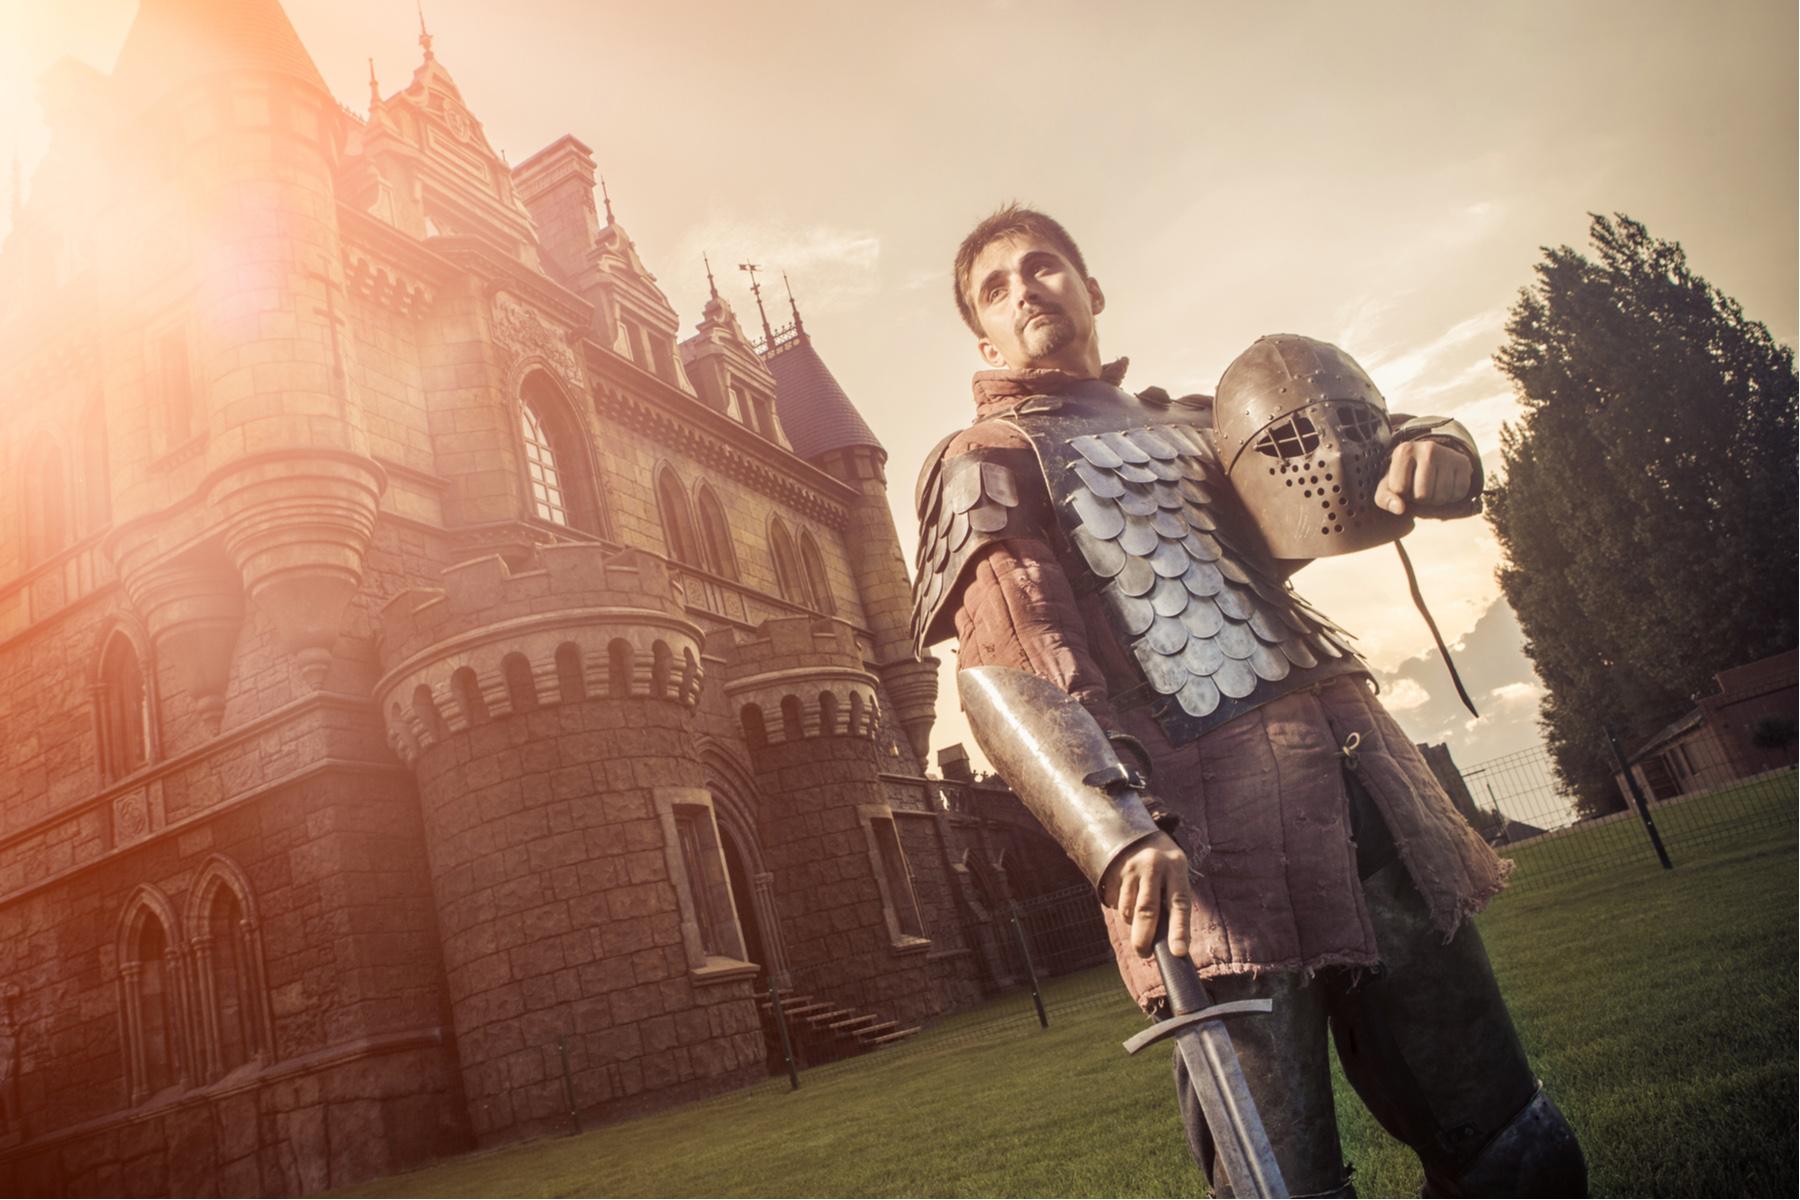 Chivalrous knight